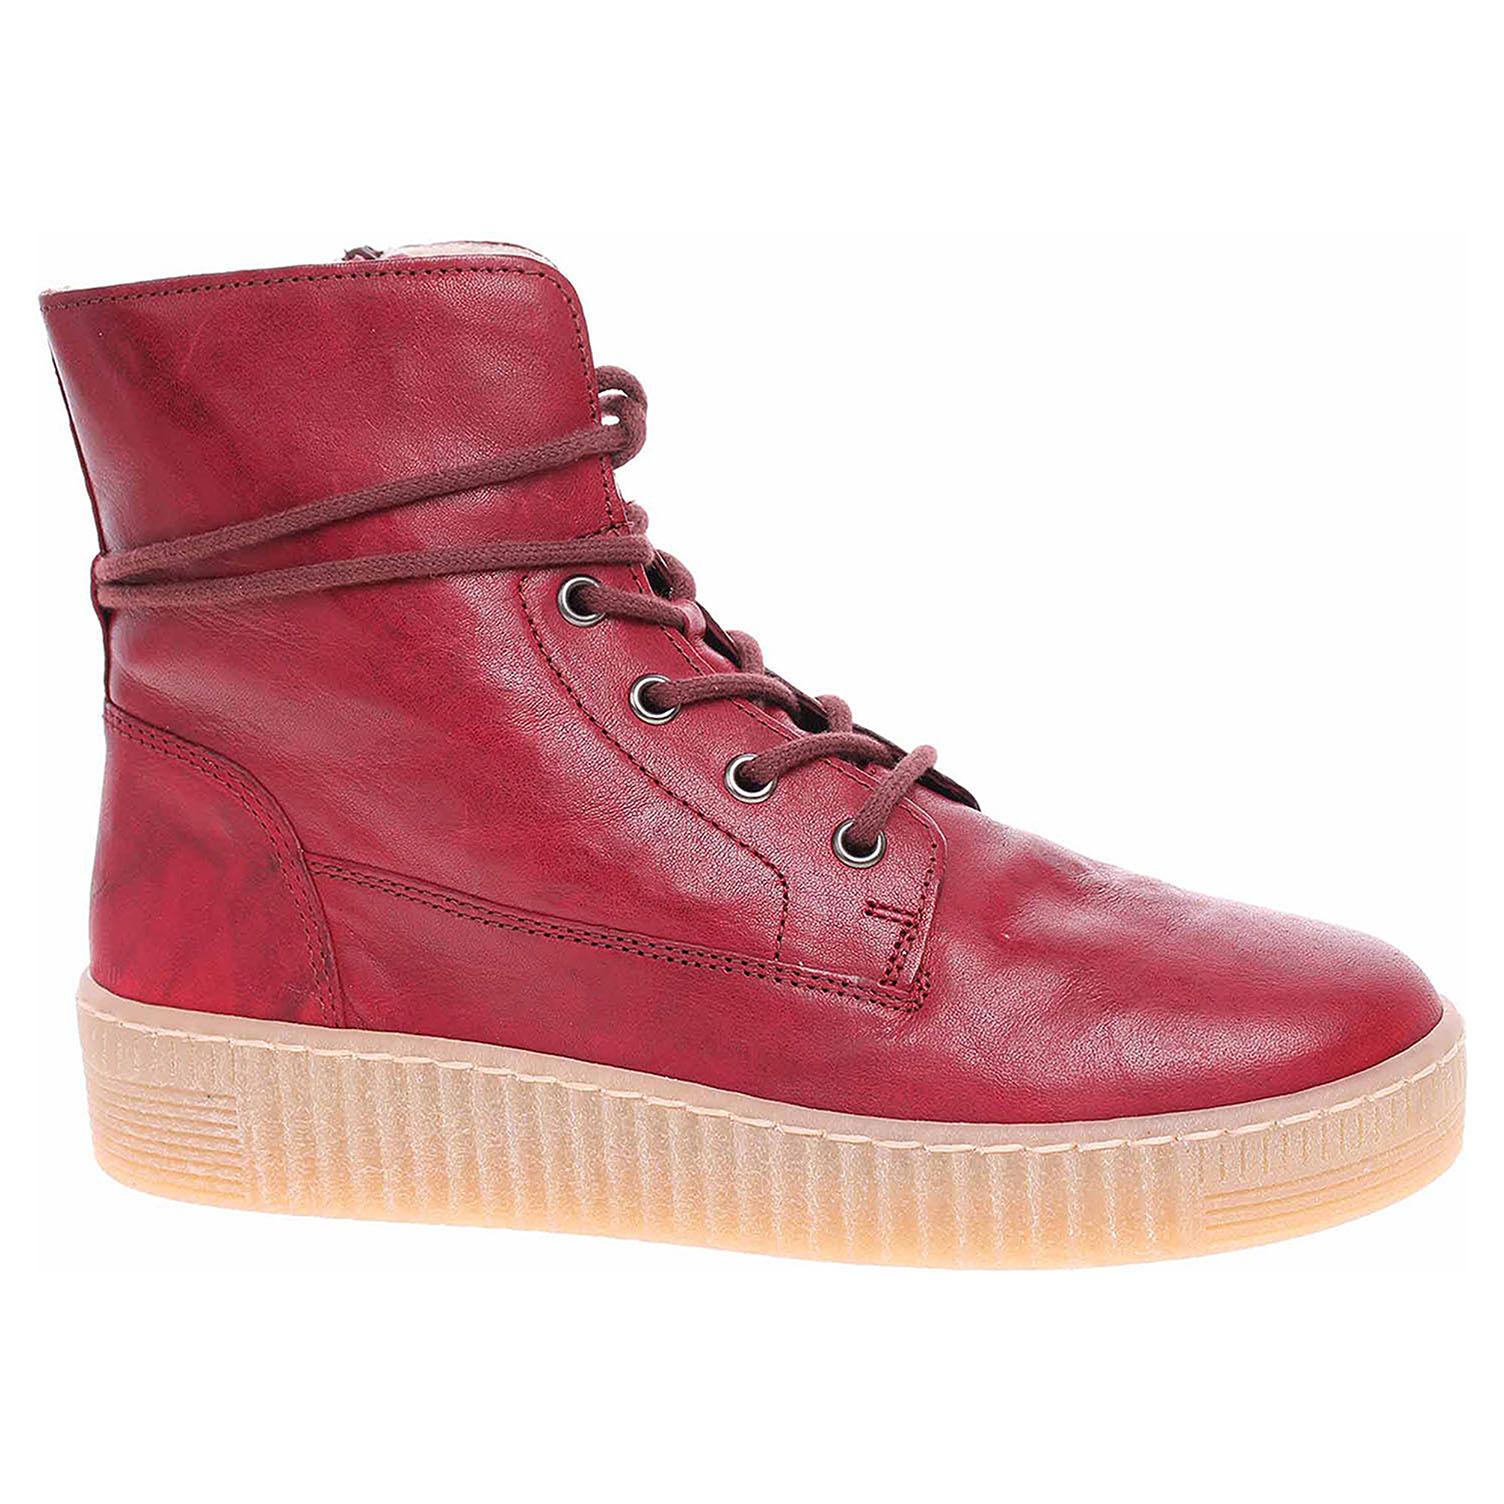 Dámská kotníková obuv Gabor 33.732.75 dark-red 33.732.75 39